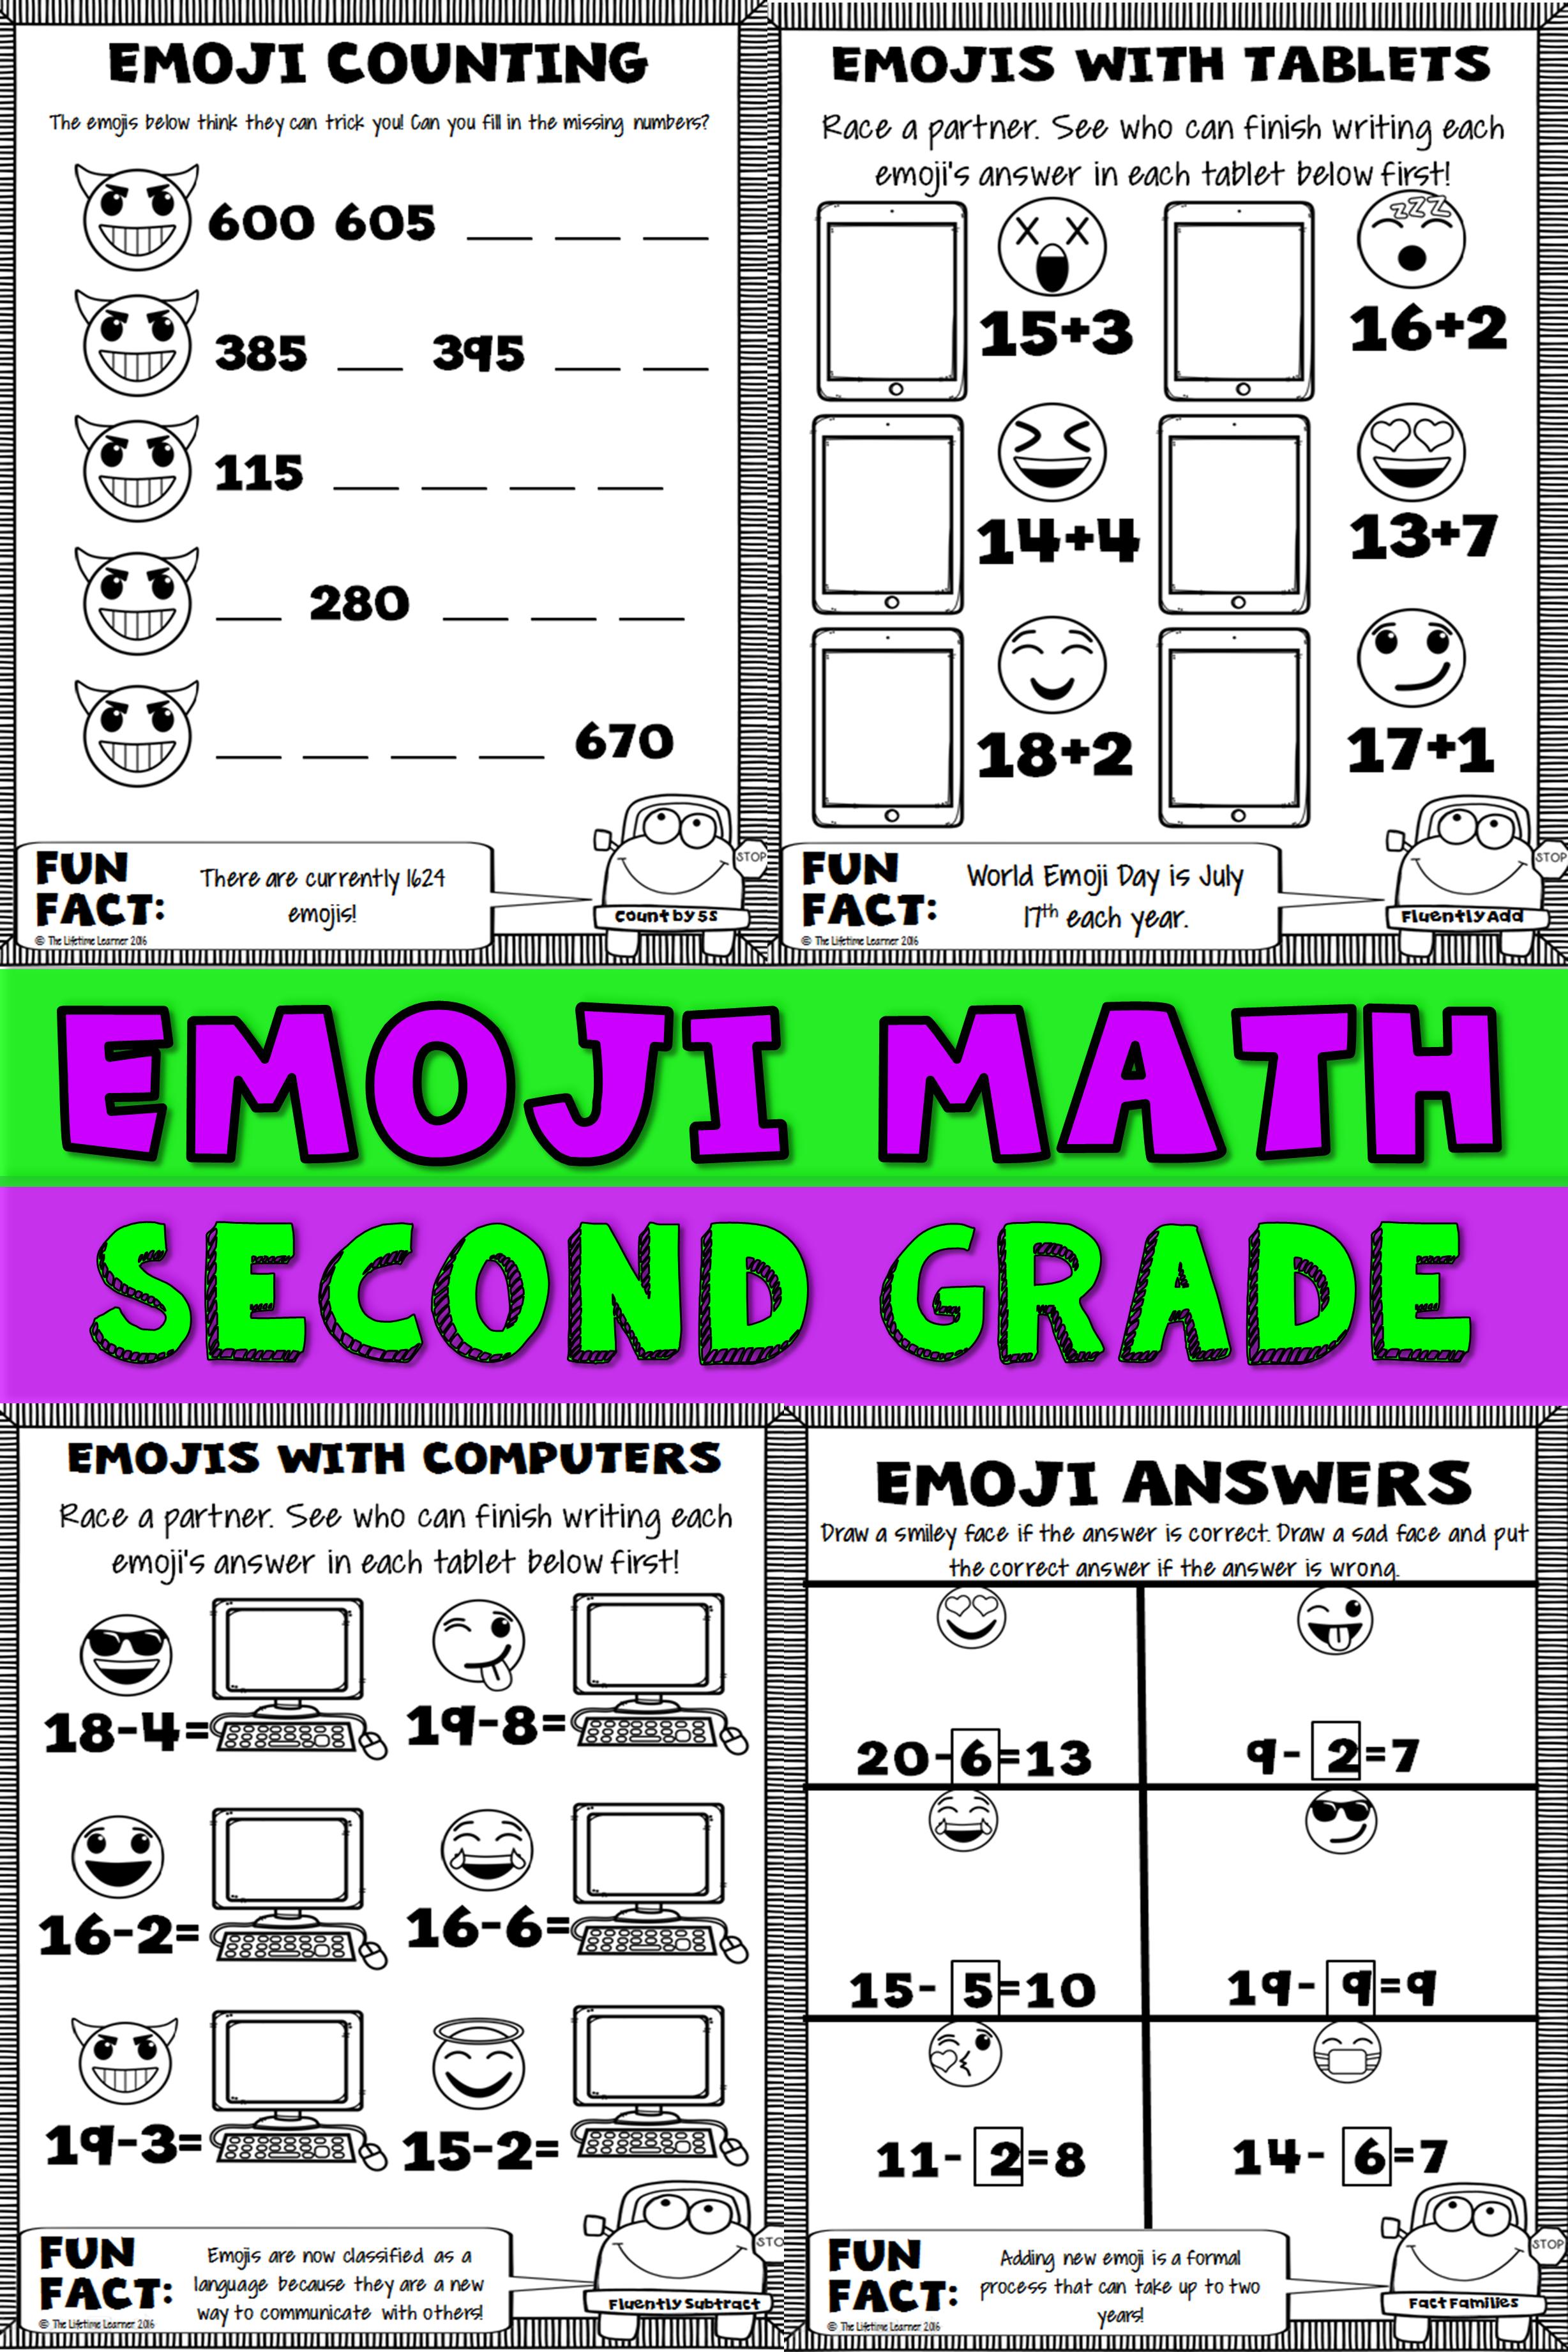 2nd Grade Emoji Math